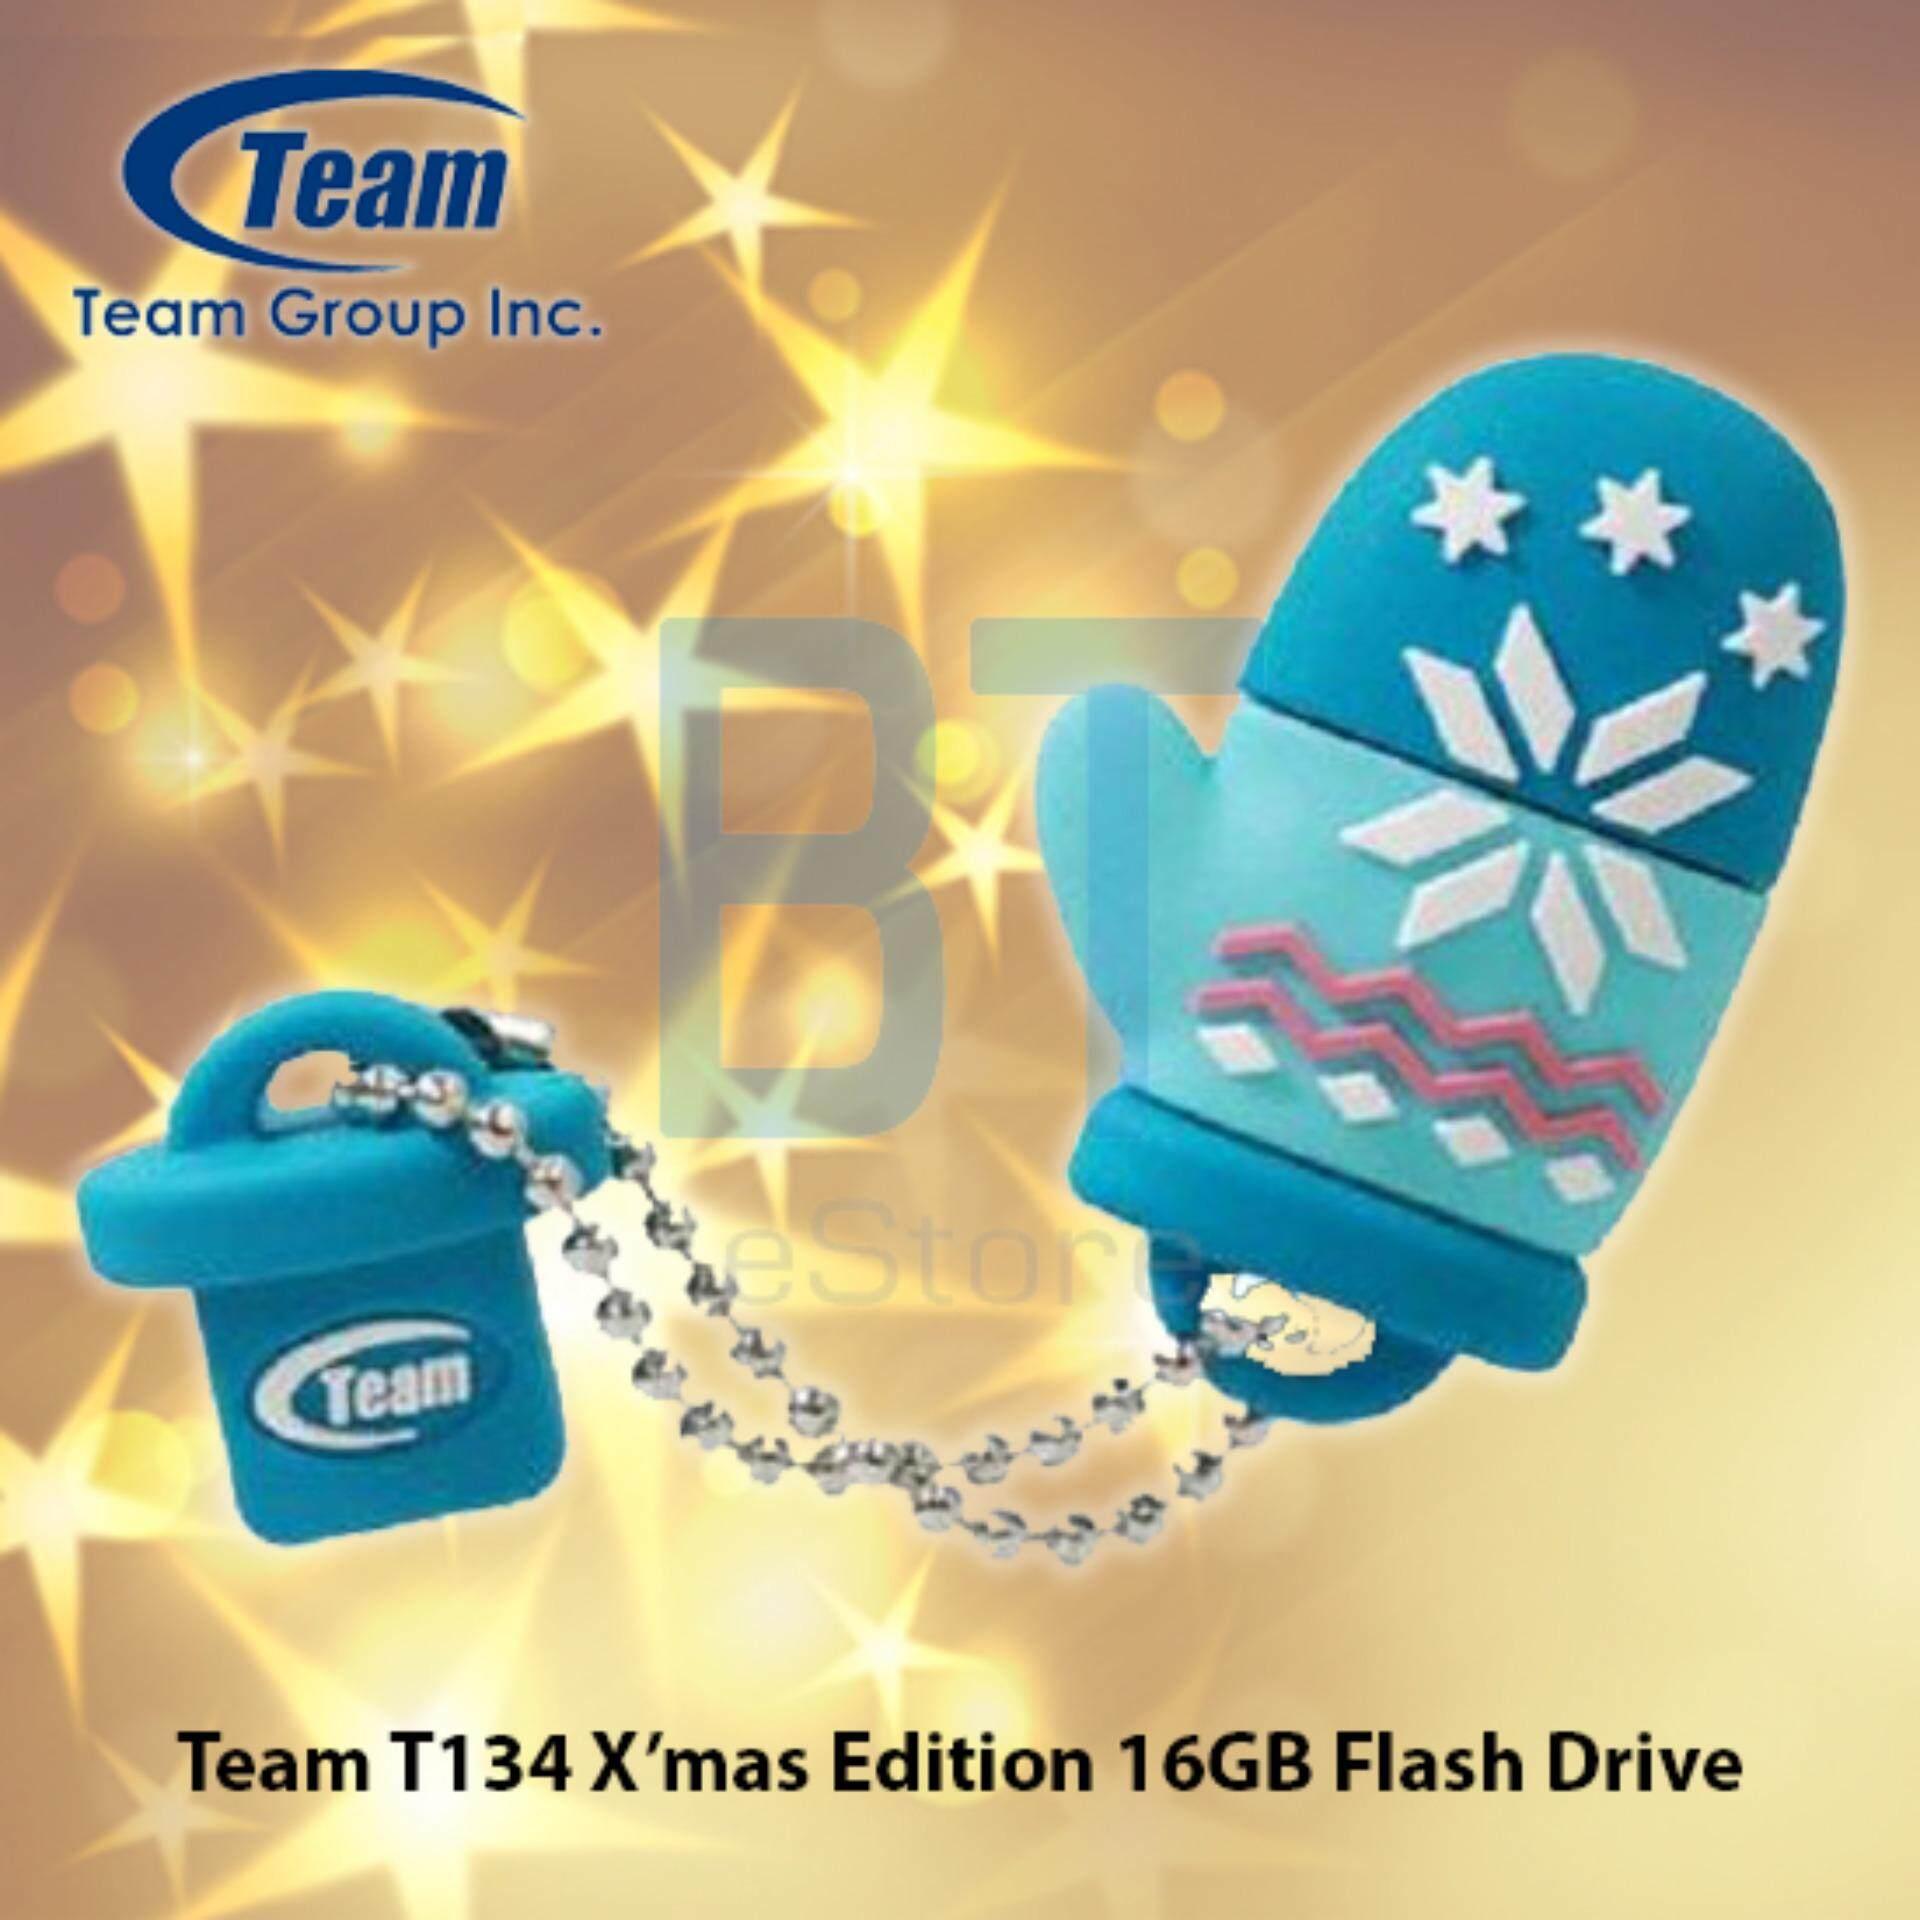 Team T134 X'mas Edition 16GB USB2.0 Flash Drive (Blue)